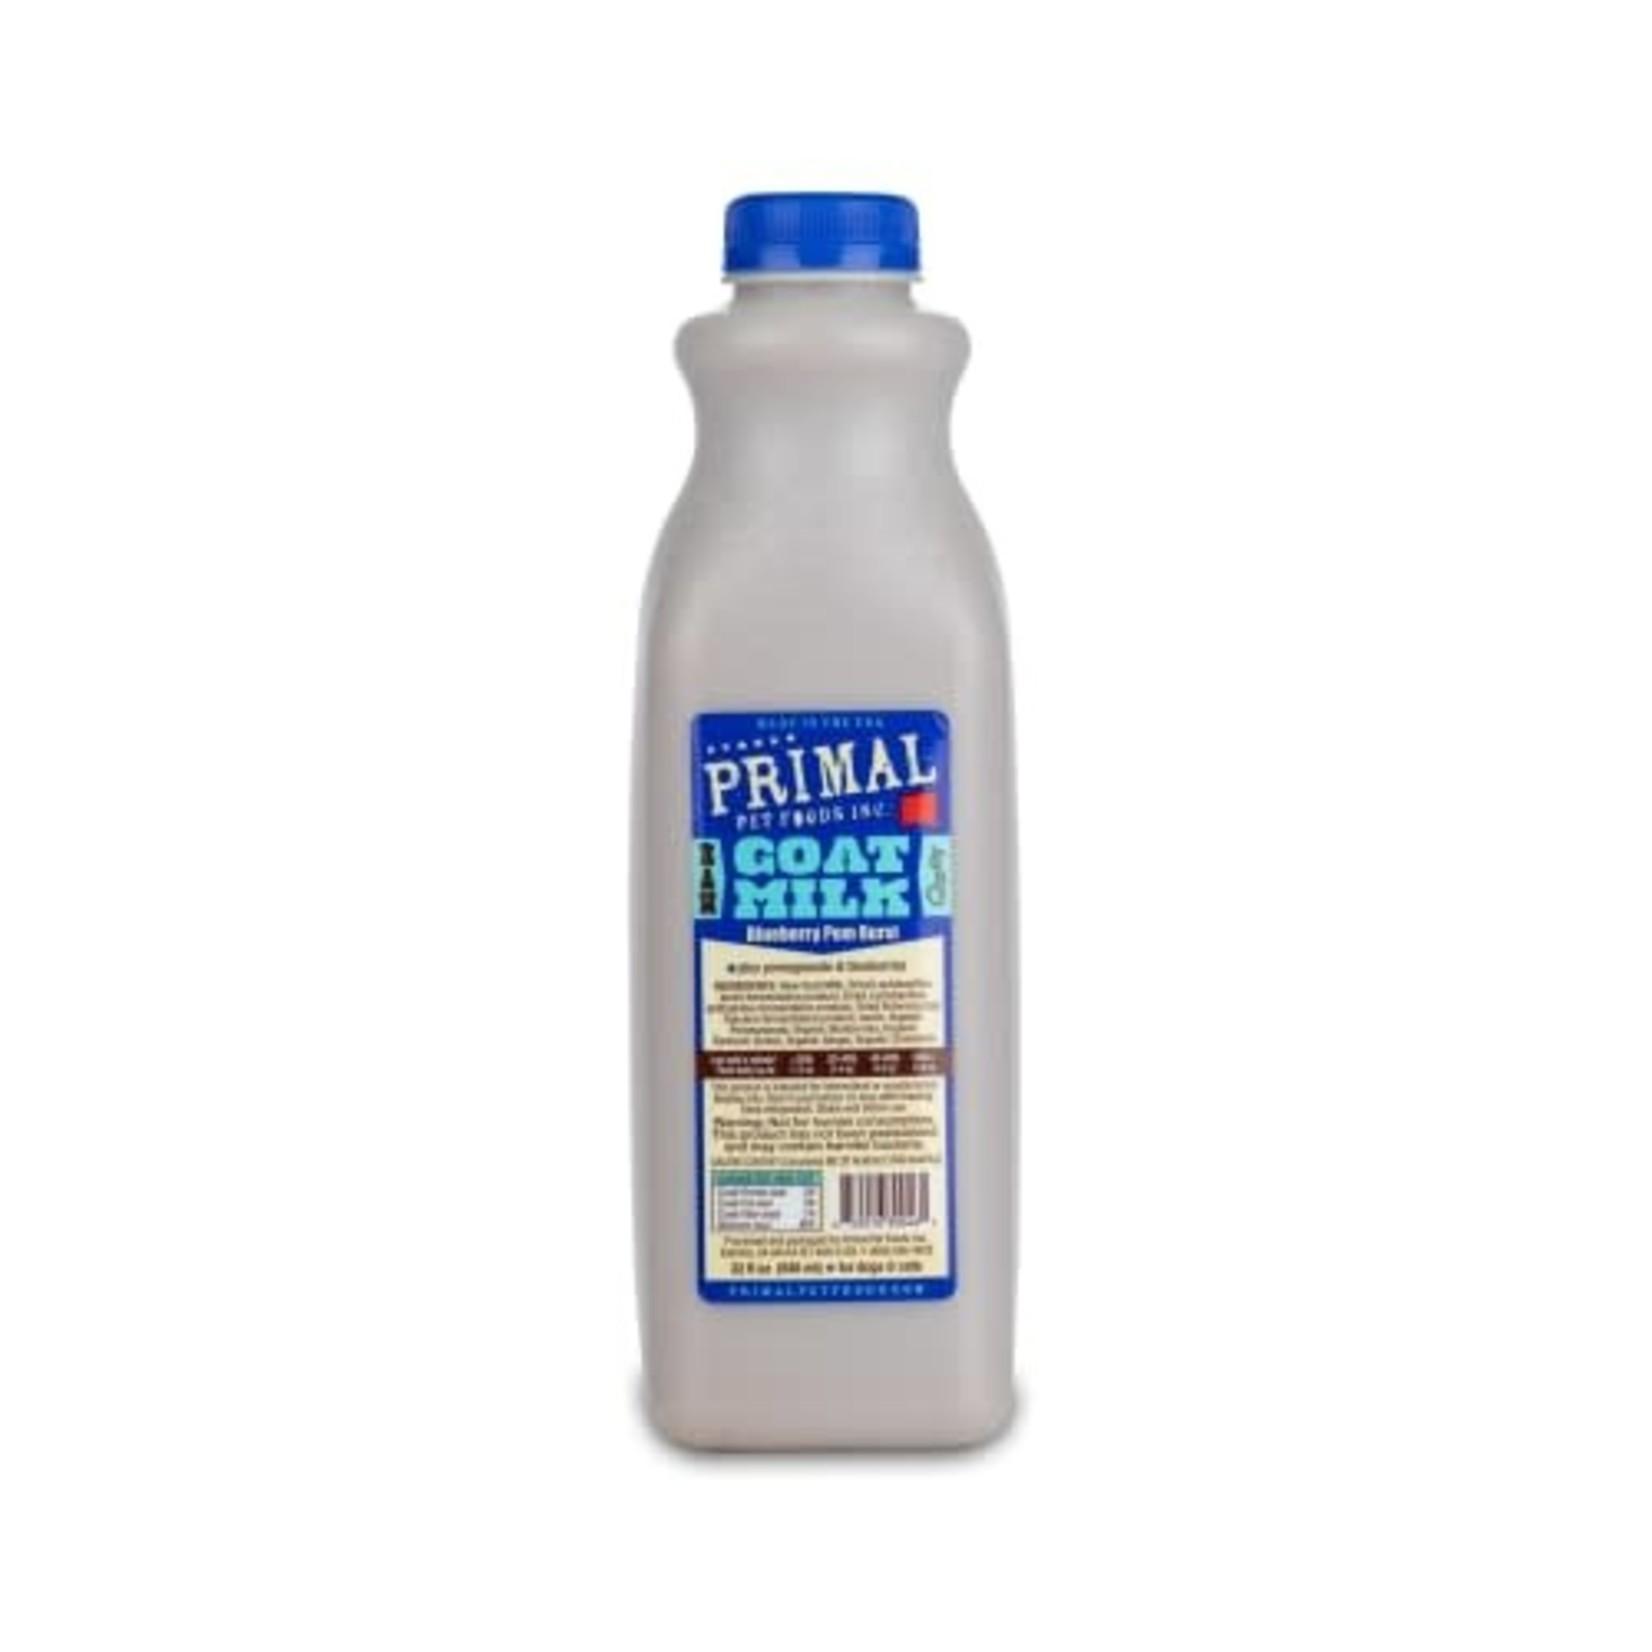 Primal Pet Foods Primal Frozen Raw Goat Milk Blueberry Burst 32 OZ